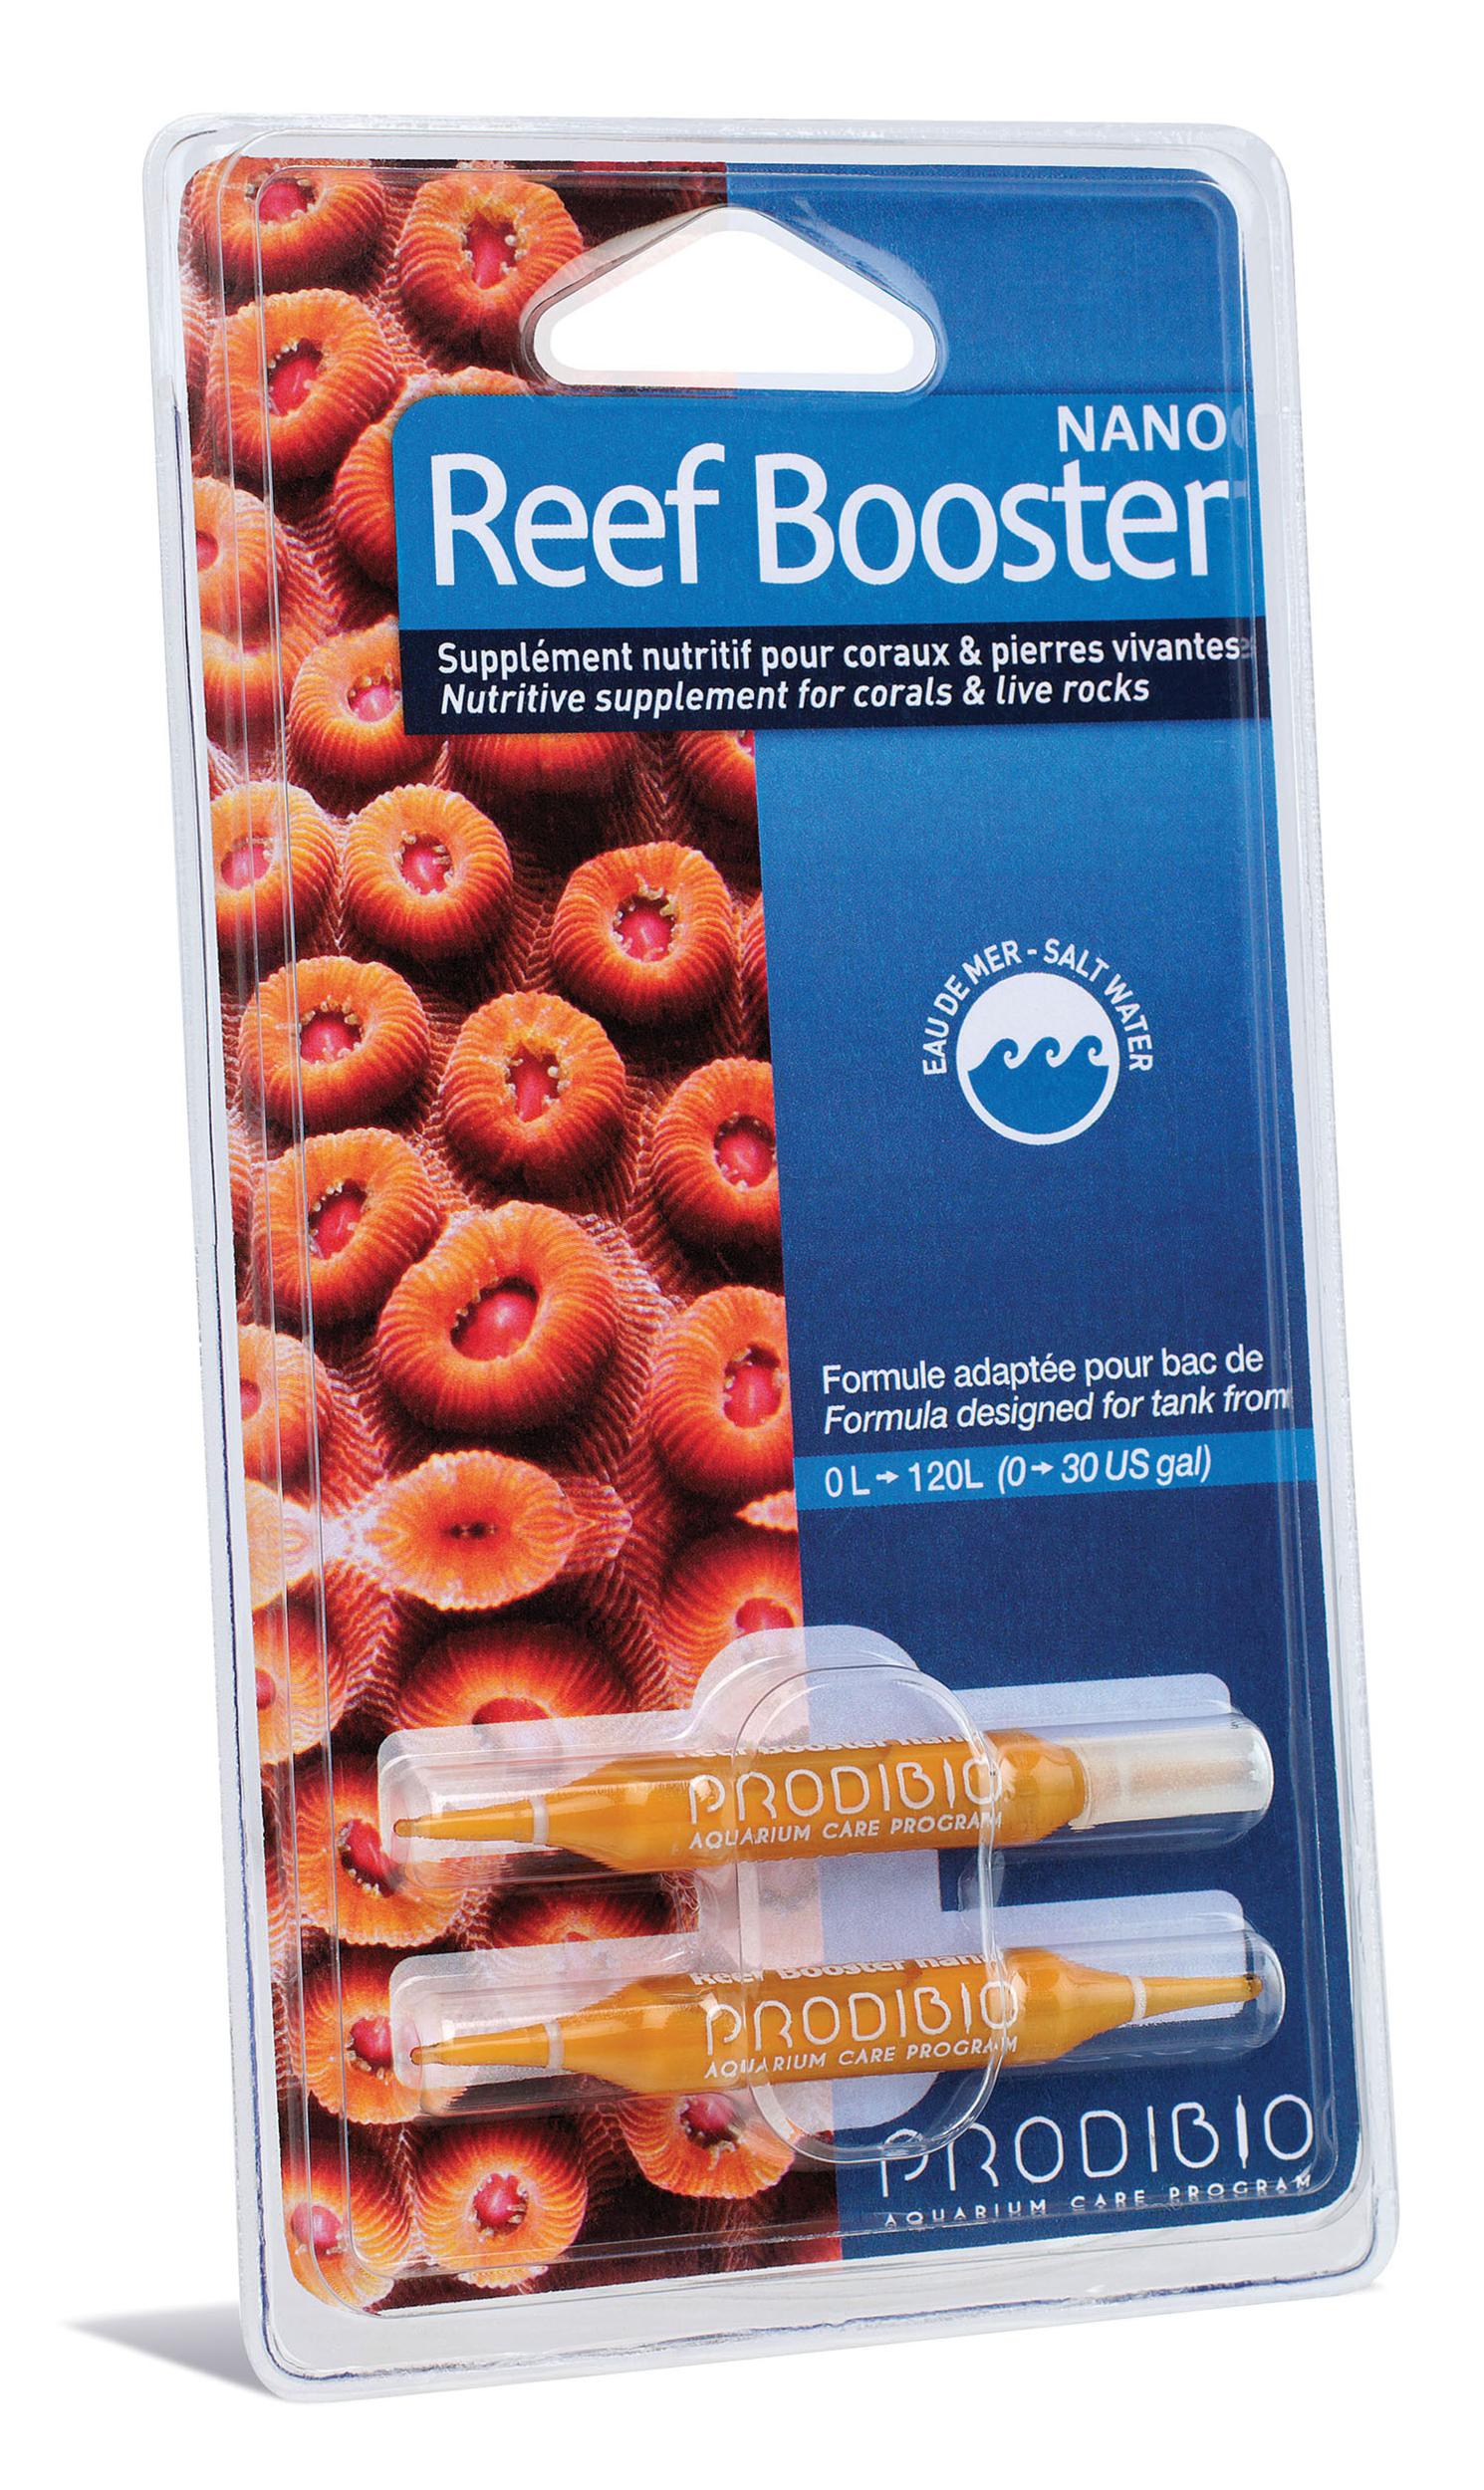 reef_booster_blister_-_4_-_prodibio